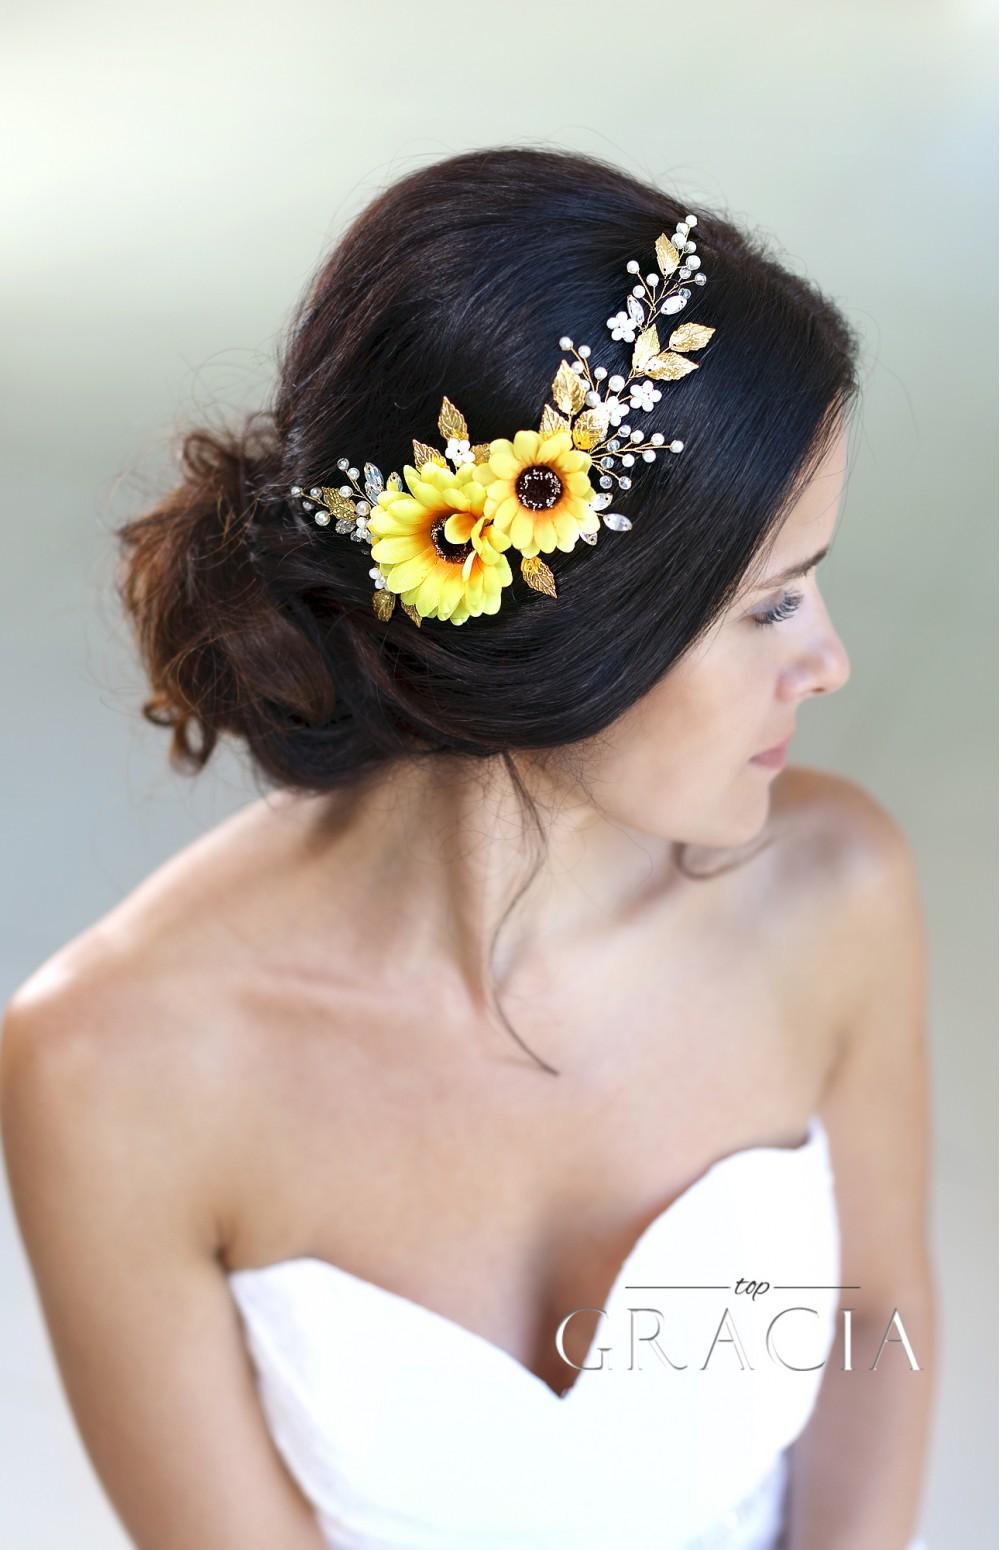 Hypatia yellow sunflower bridal headpiece fall wedding flower crown hypatia yellow sunflower bridal headpiece fall wedding flower crown autumn halo by topgracia mightylinksfo